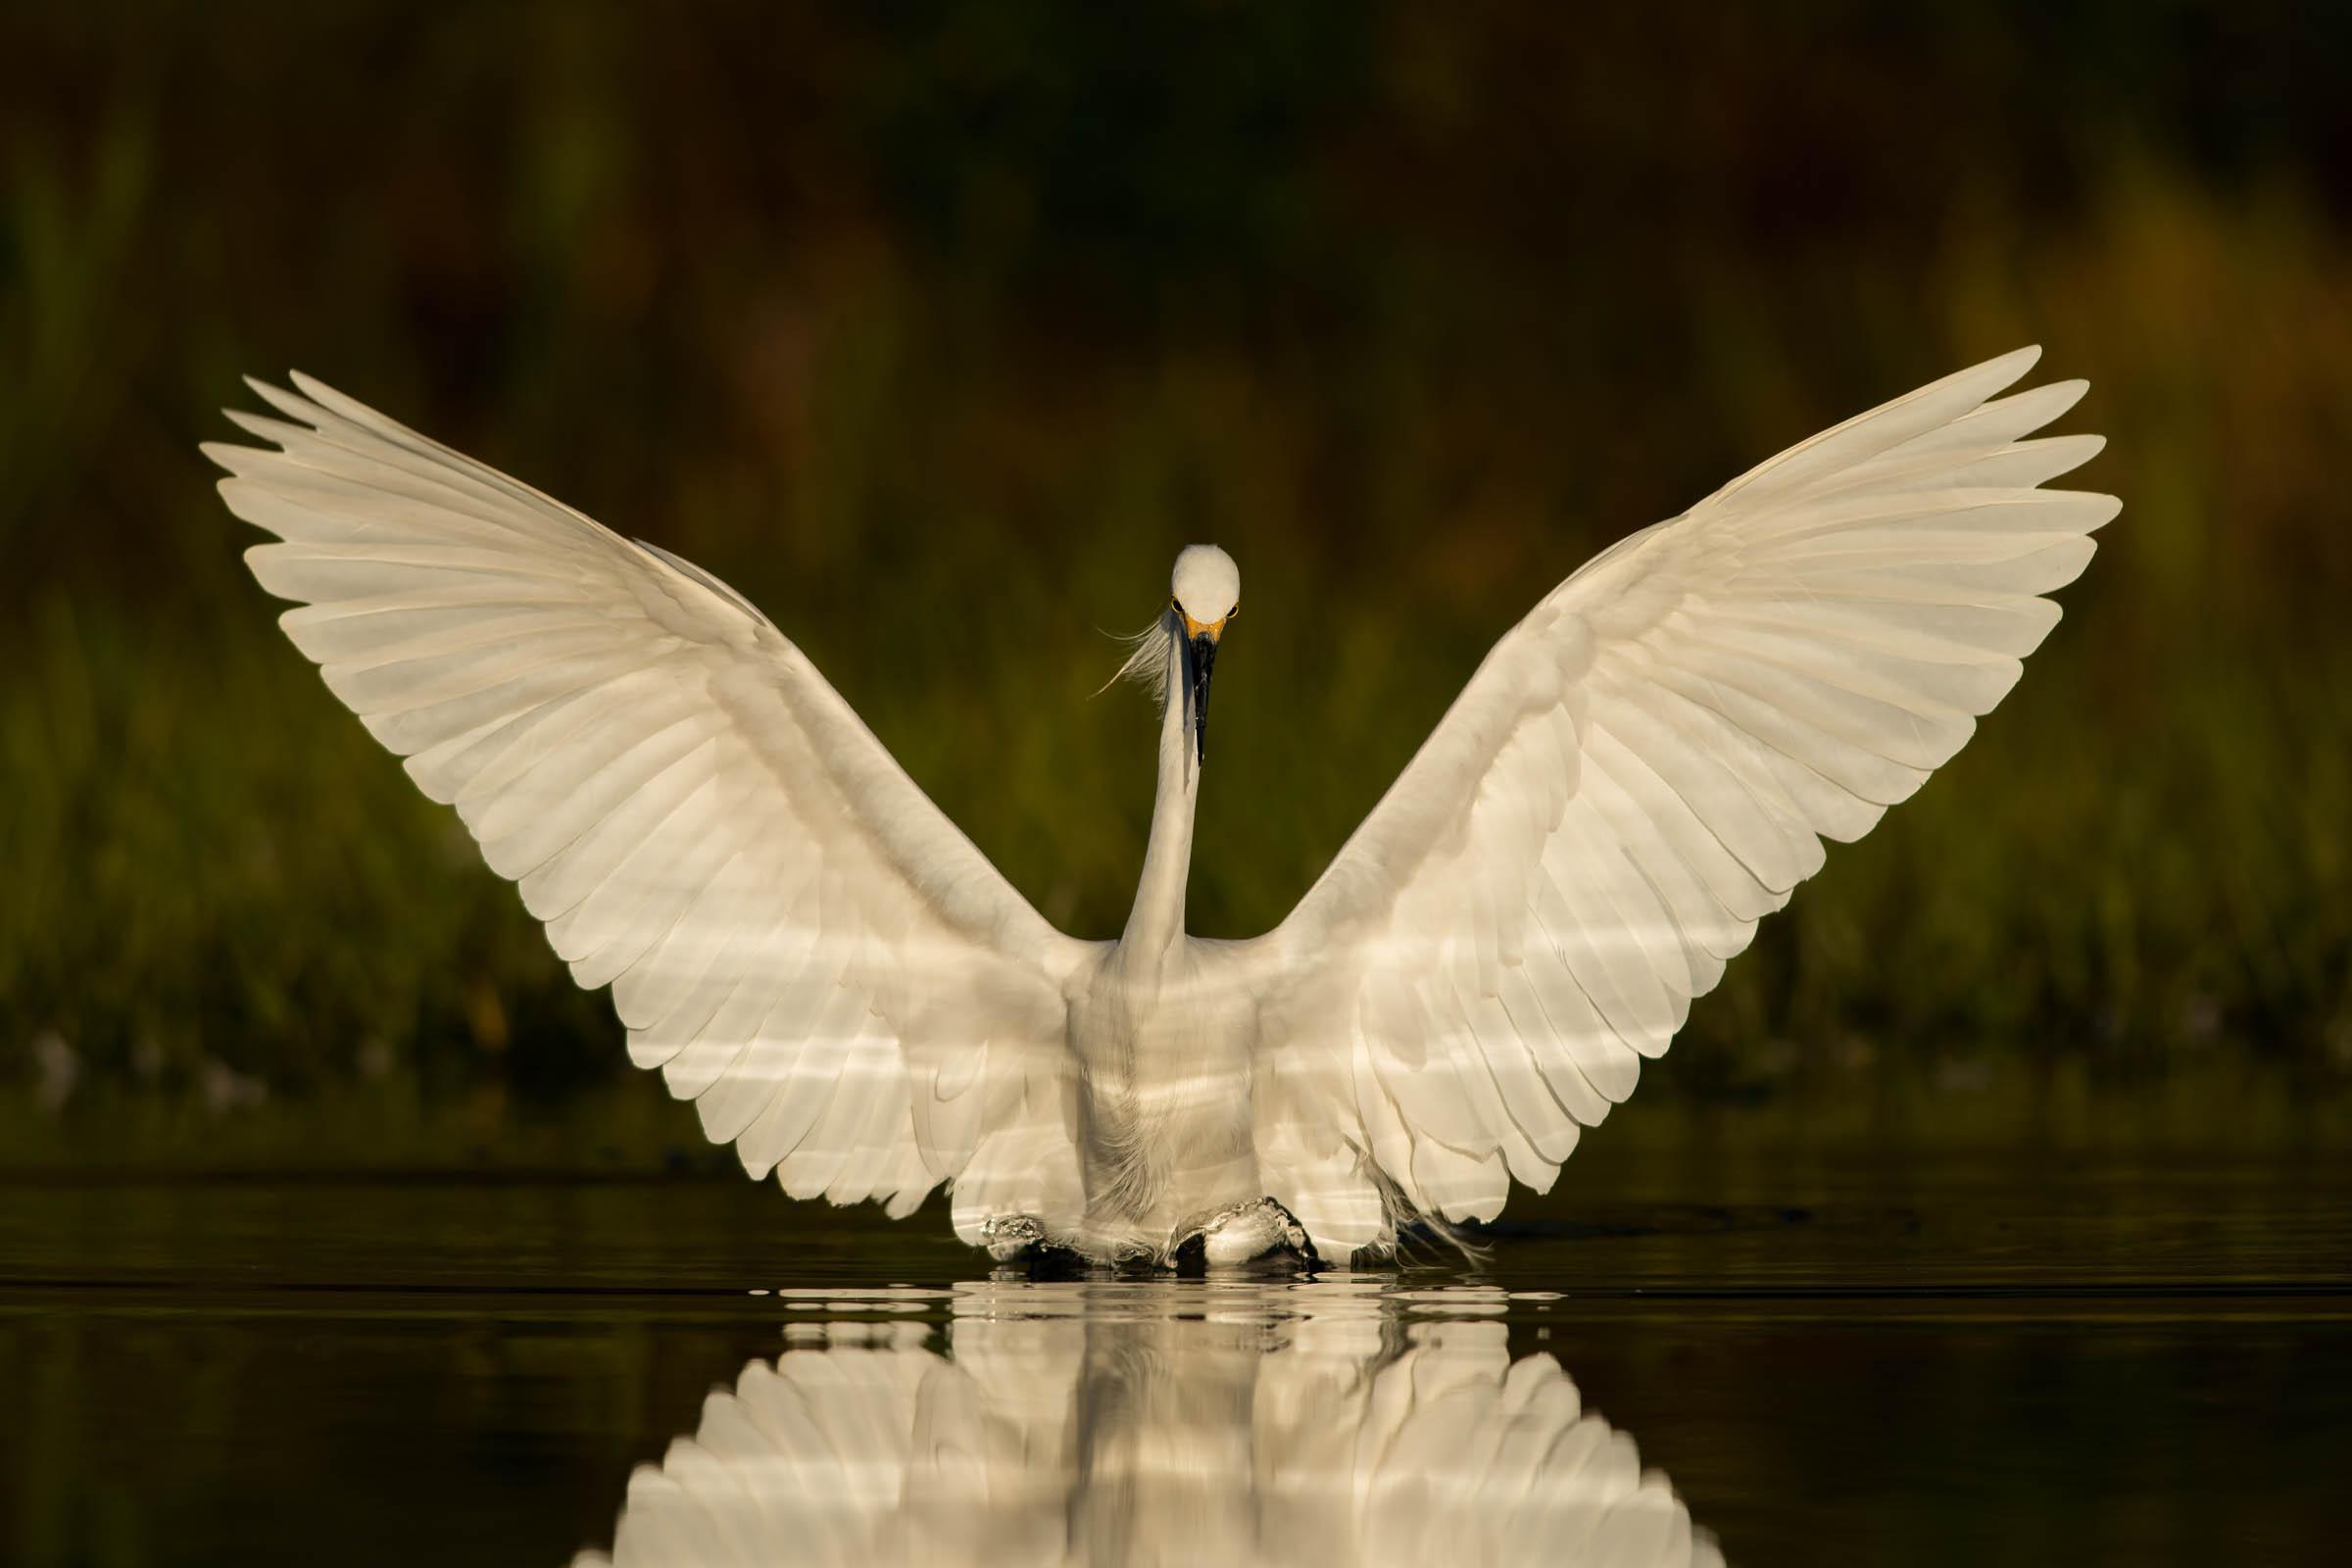 Snowy Egret. Peter Brannon/Audubon Photography Awards